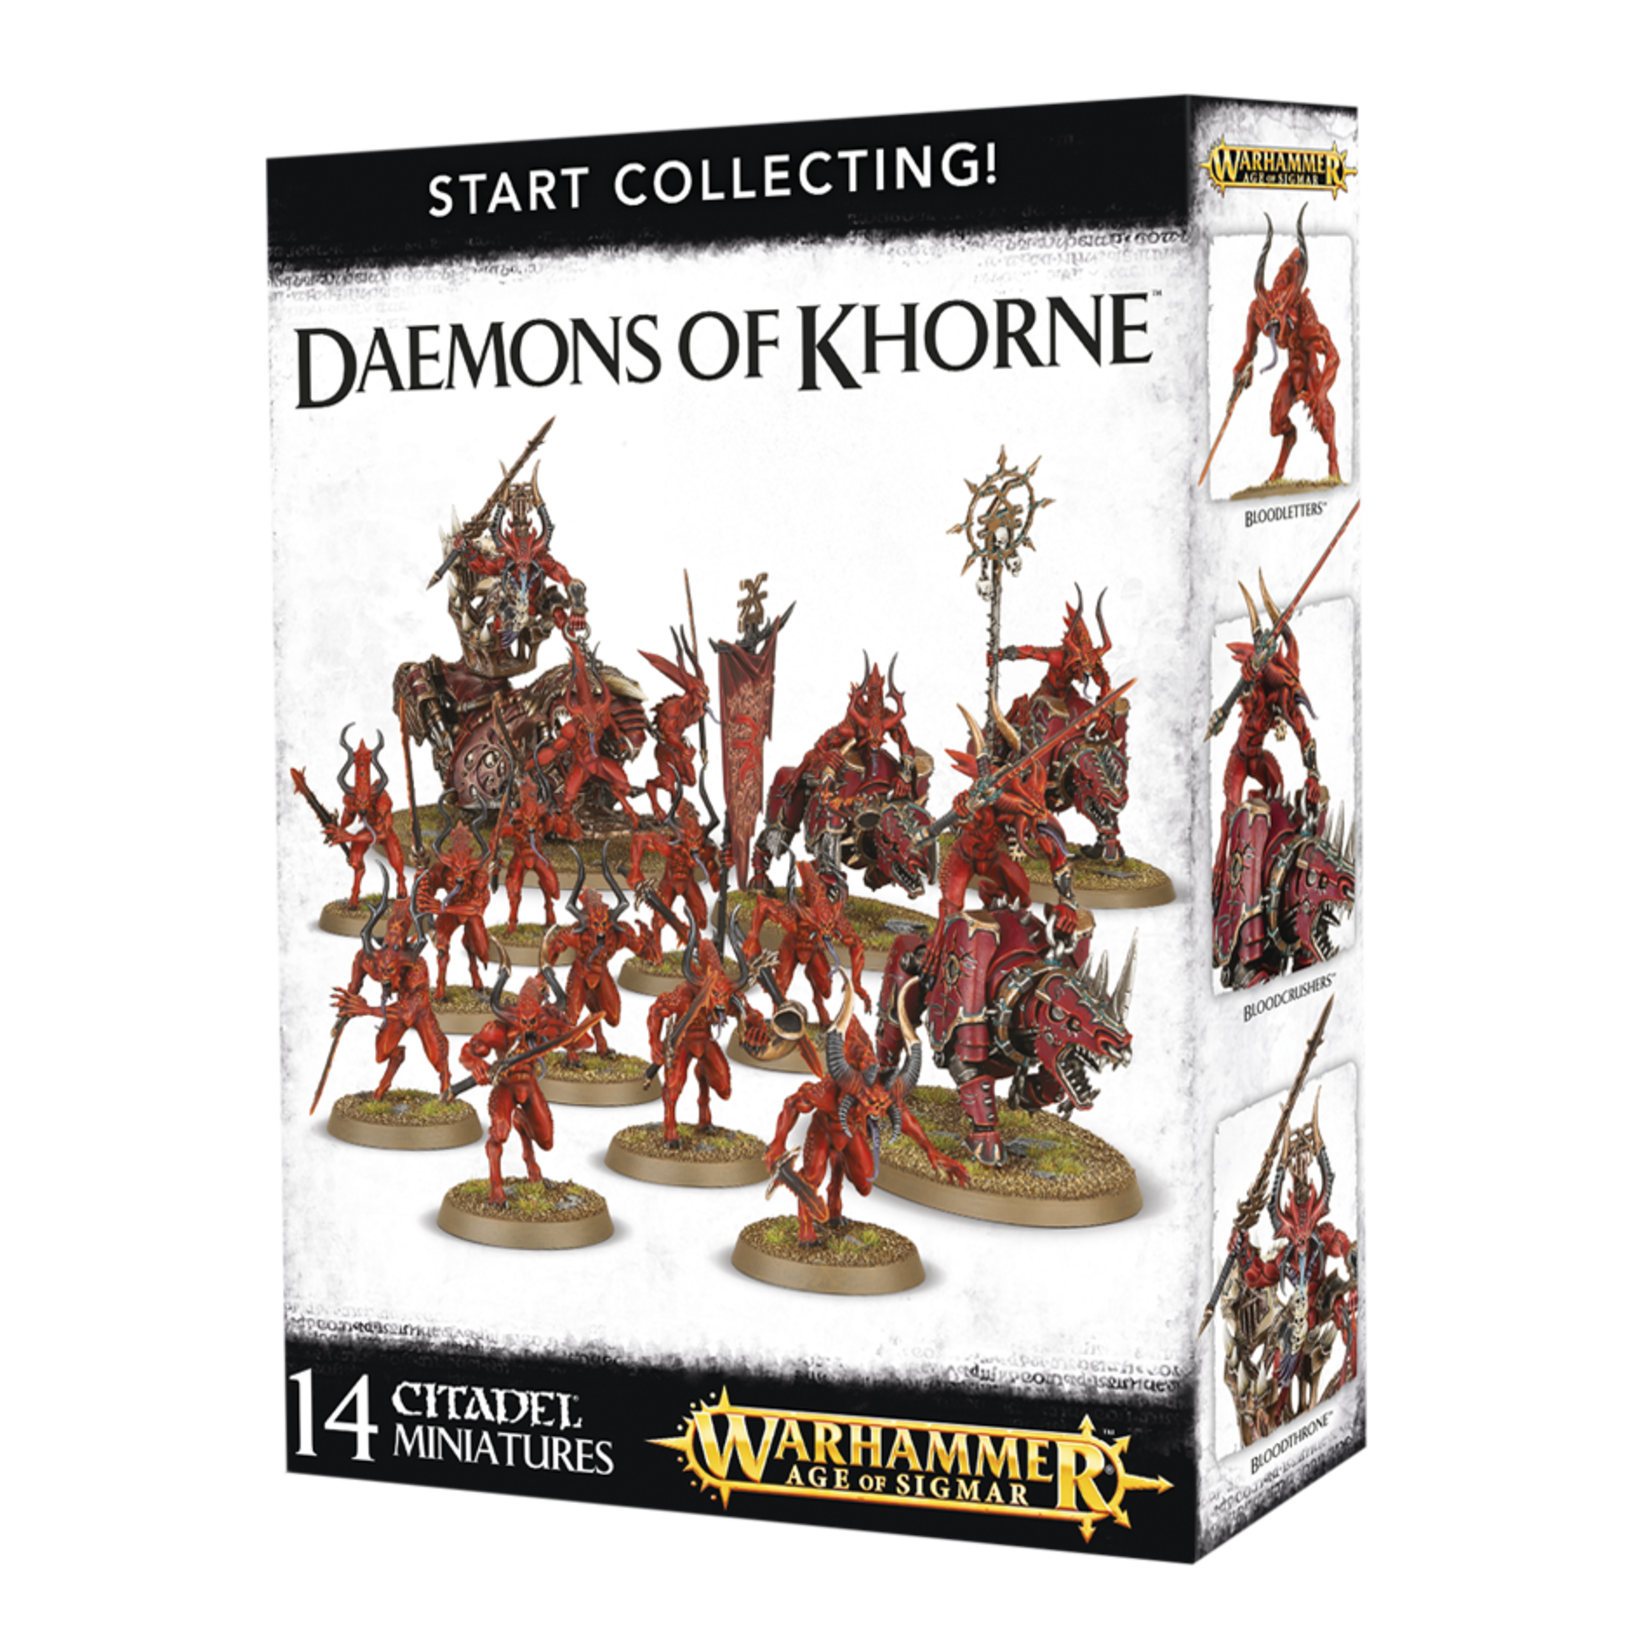 Games Workshop Warhammer 40k: Start Collecting! Daemons of Khorne